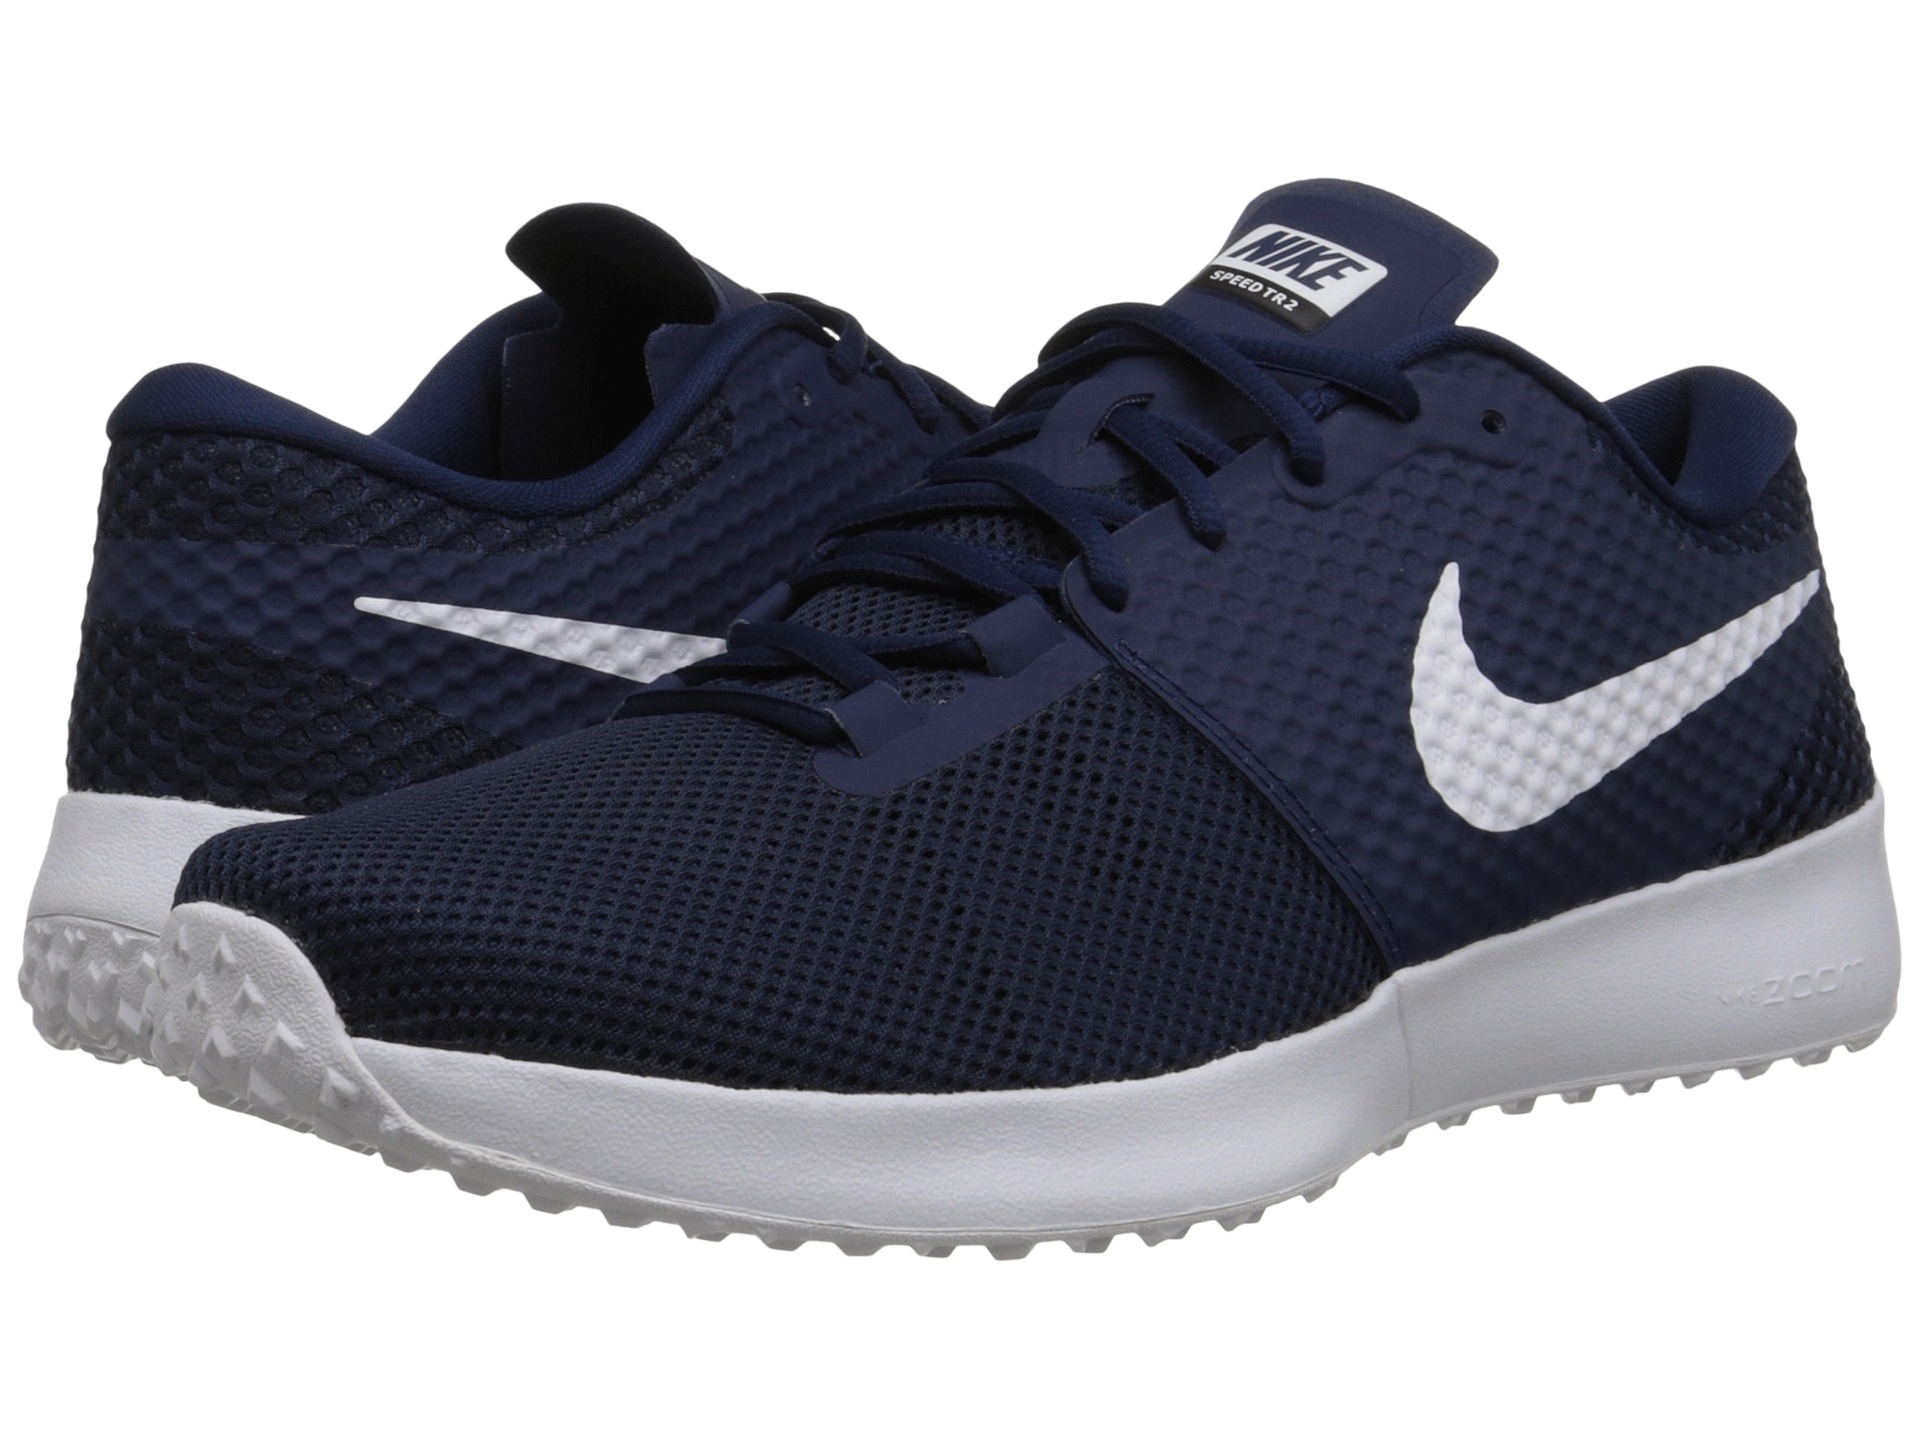 nike tr2 ,nike air jordan retro shoes ,air jordan shoes on sale ...